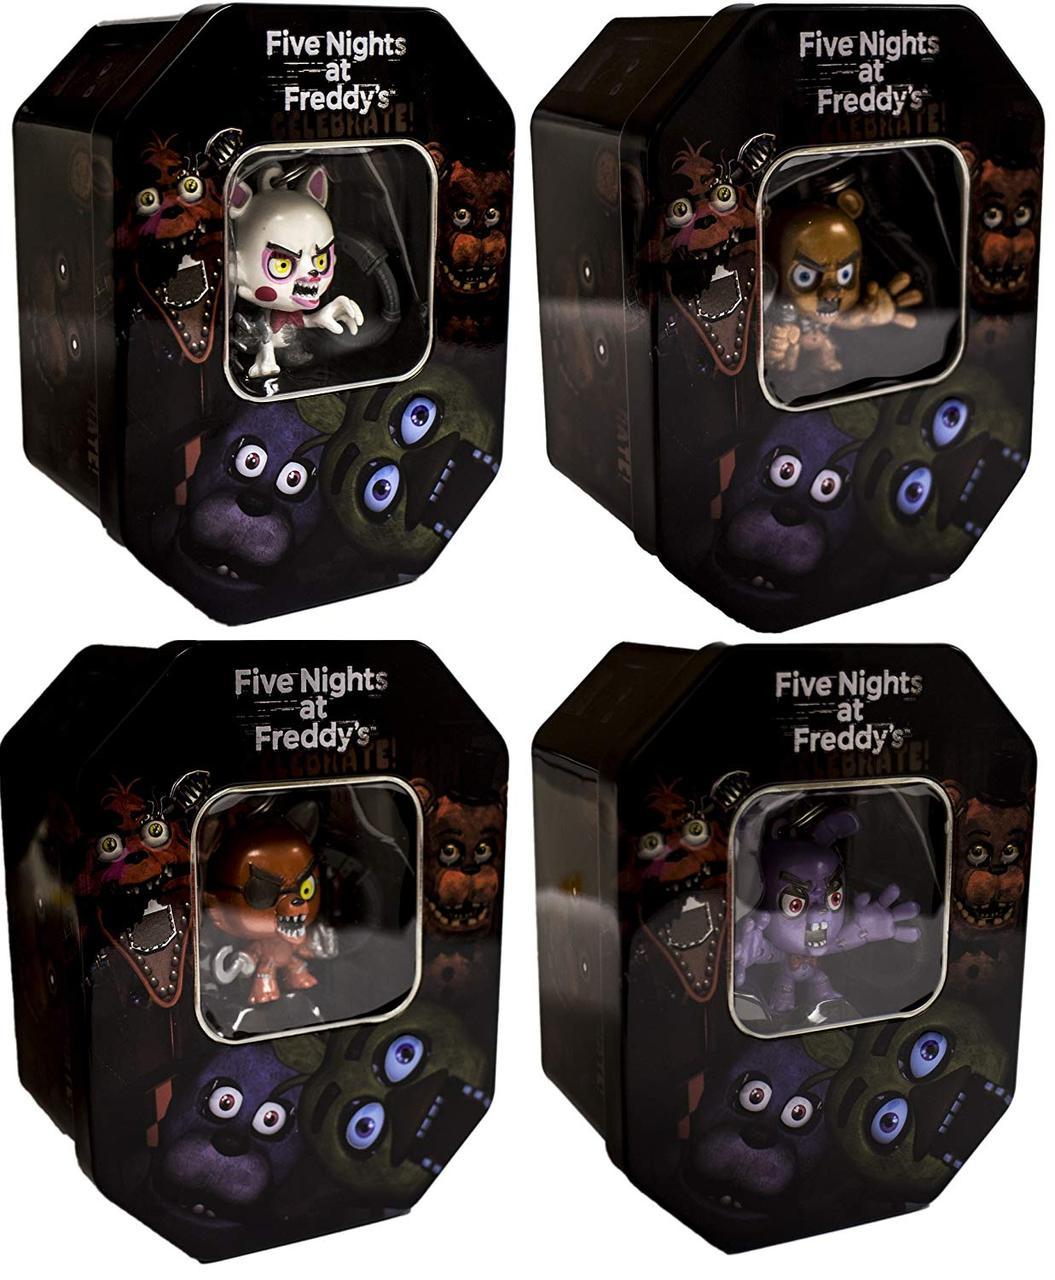 Эксклюзивный набор для коллекционеров Five Nights at Freddy's Exclusive «Mangle, Bonnie, Foxy & Freddy».